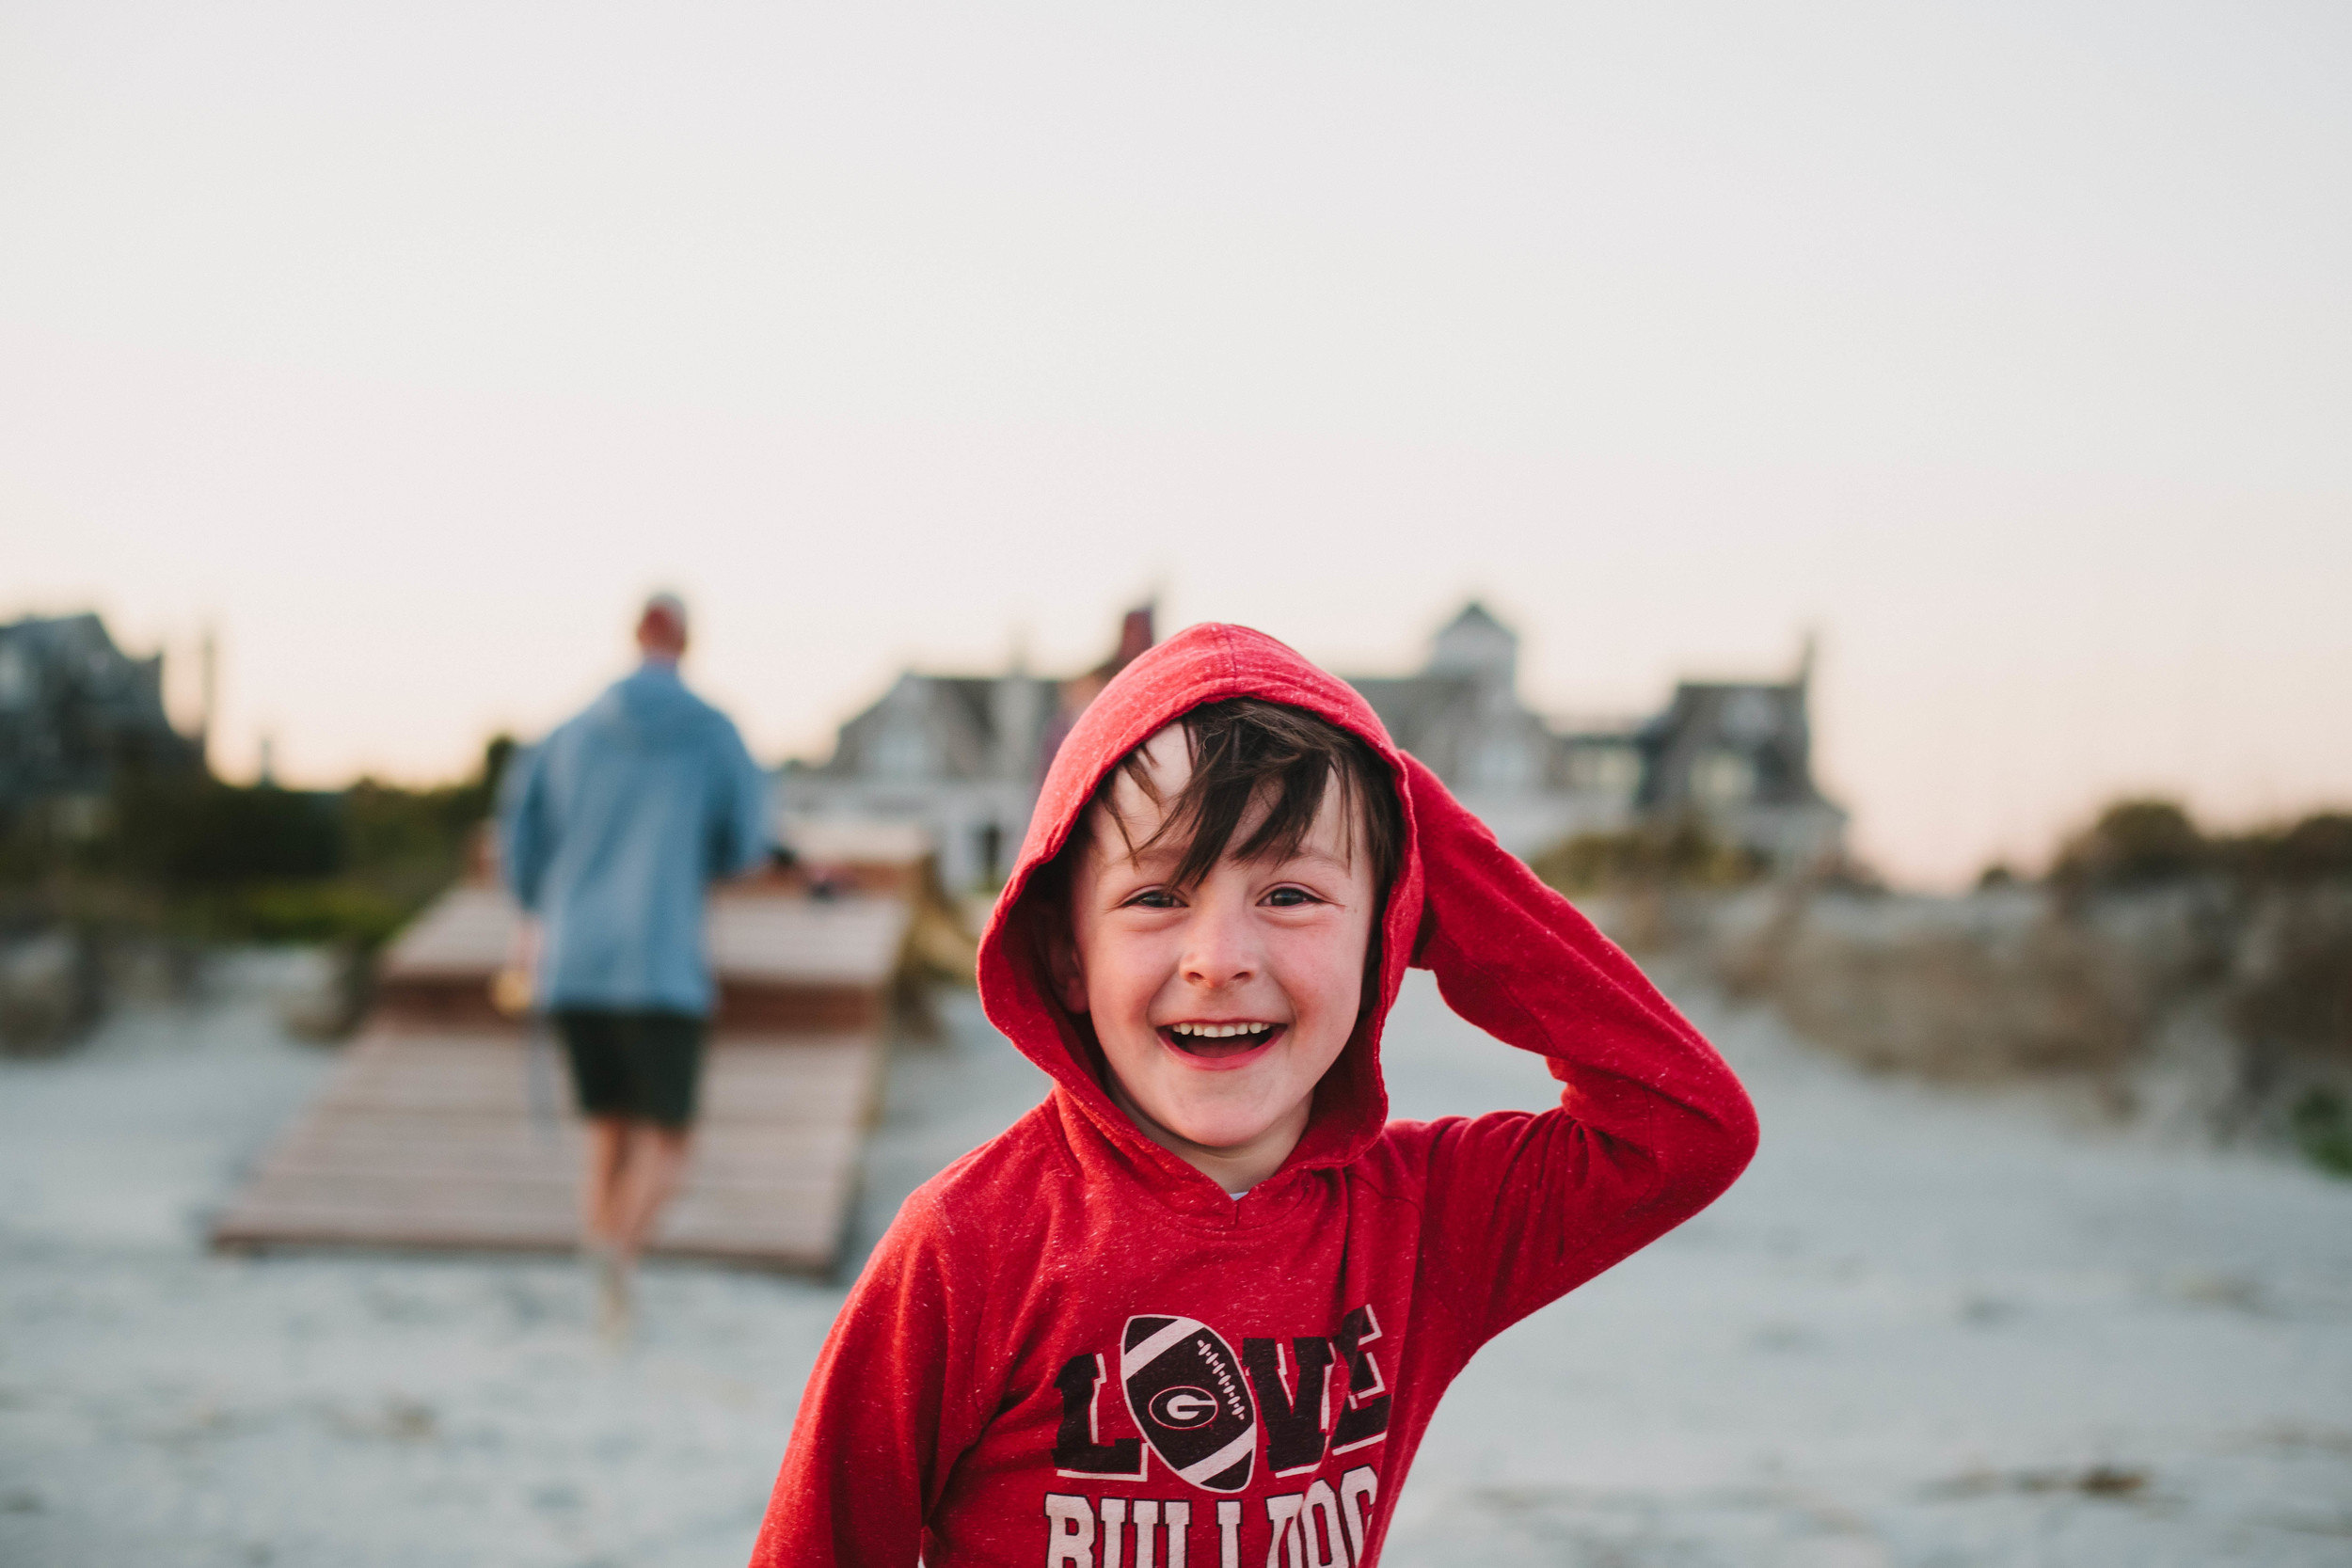 Image of boy smiling at the camera at the beach